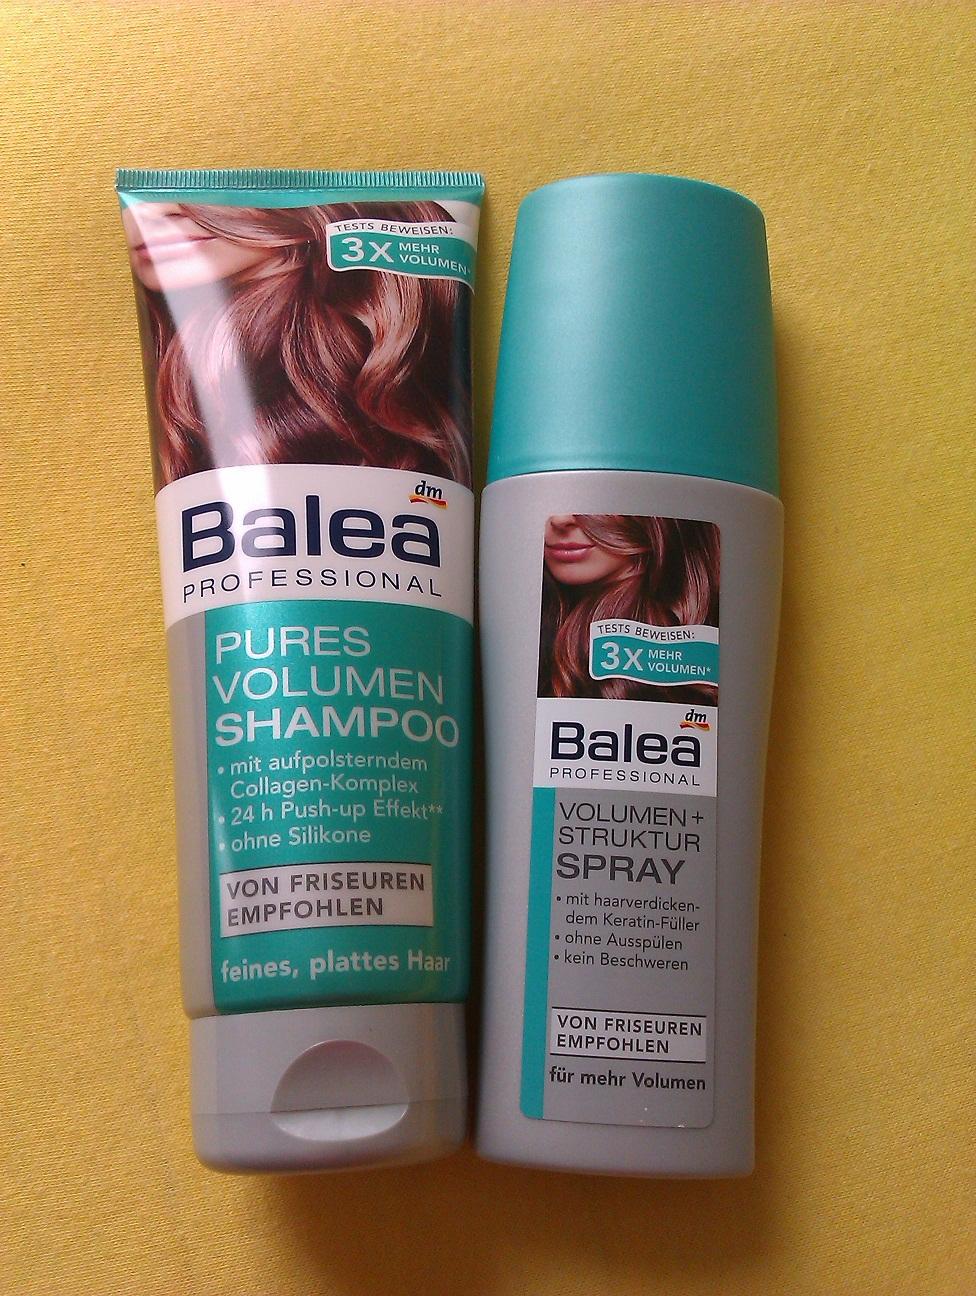 balea pures volumen shampoo fazit babsi s beauty gossip. Black Bedroom Furniture Sets. Home Design Ideas